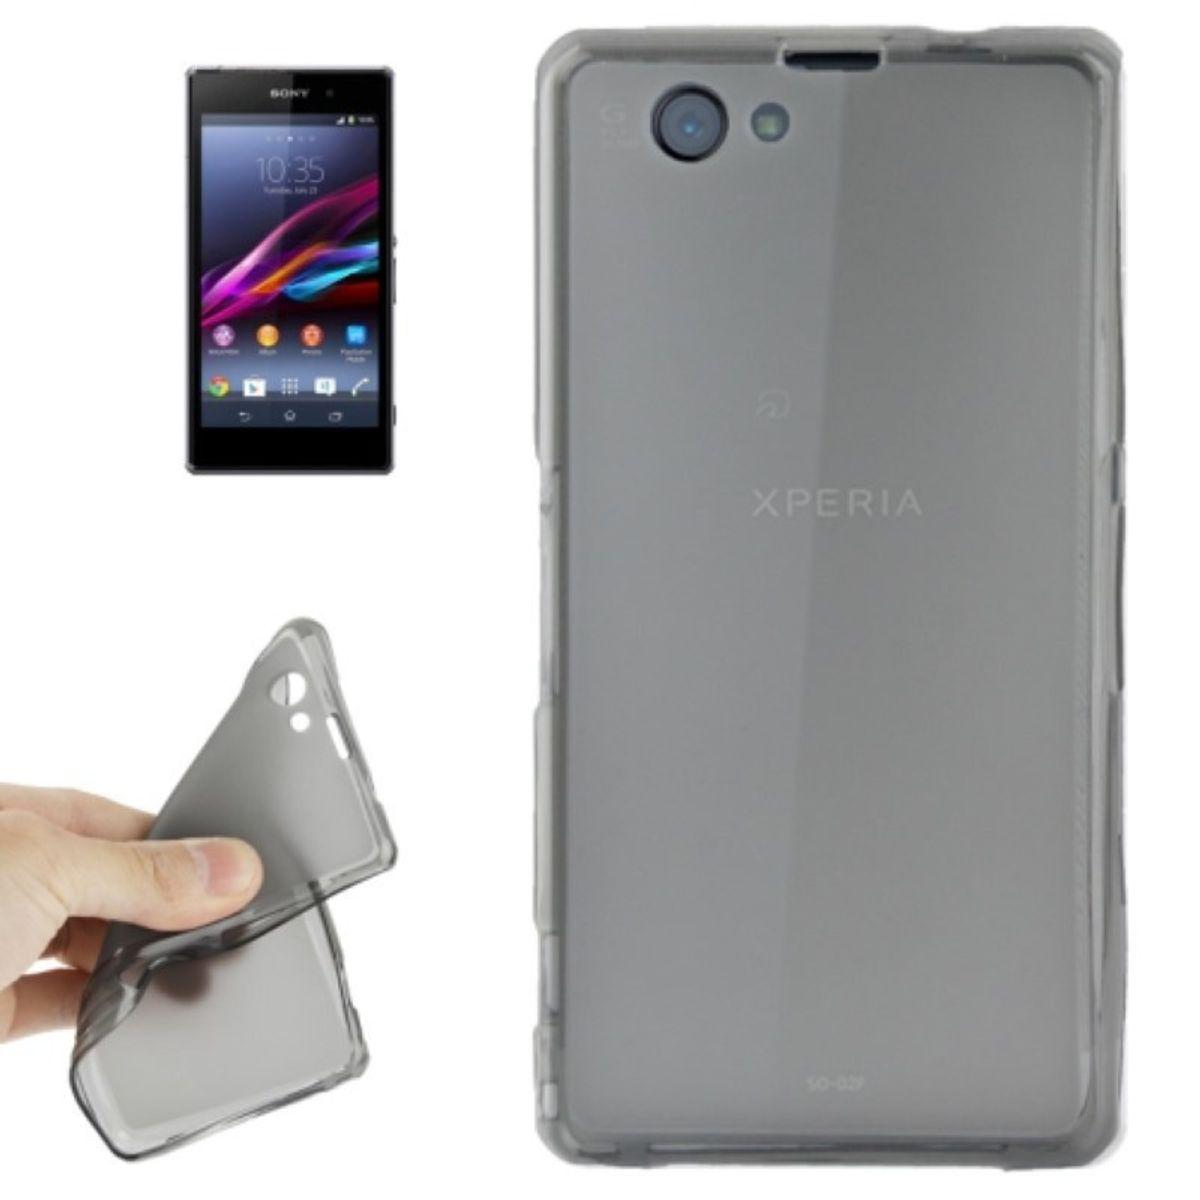 Handyhülle Transluzente TPU Tasche für Sony Xperia Z1 mini Grau